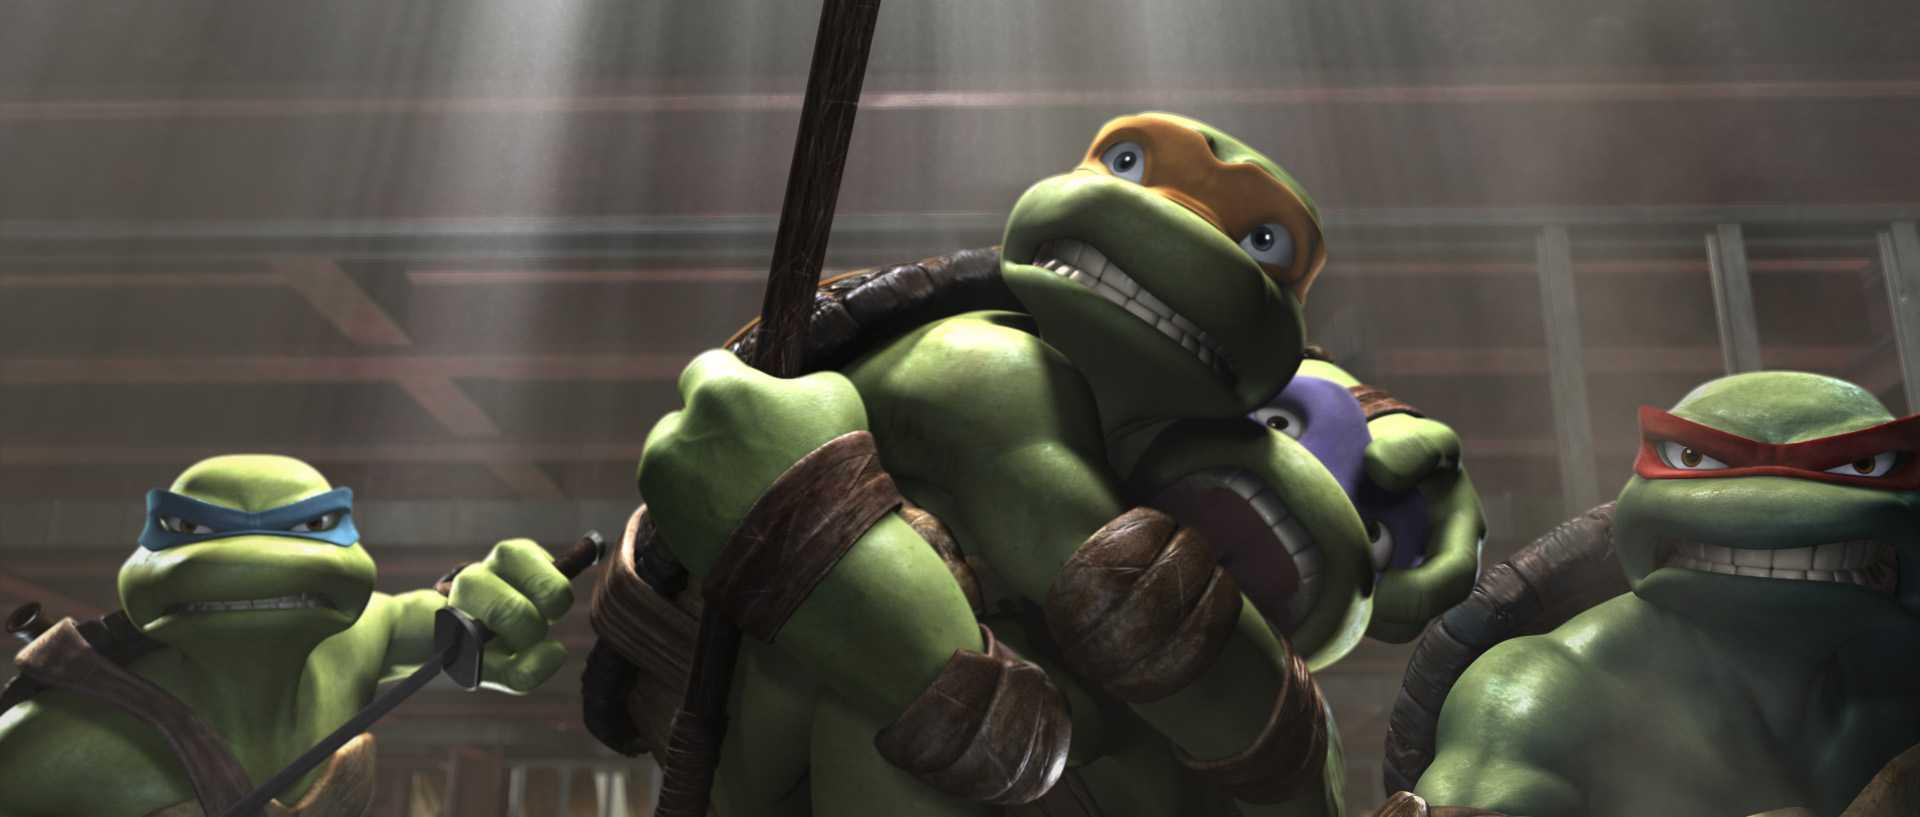 tmnt-teenaage-mutant-ninja-turtles-movie-2007-hugging-michelangelo-donatello.jpg